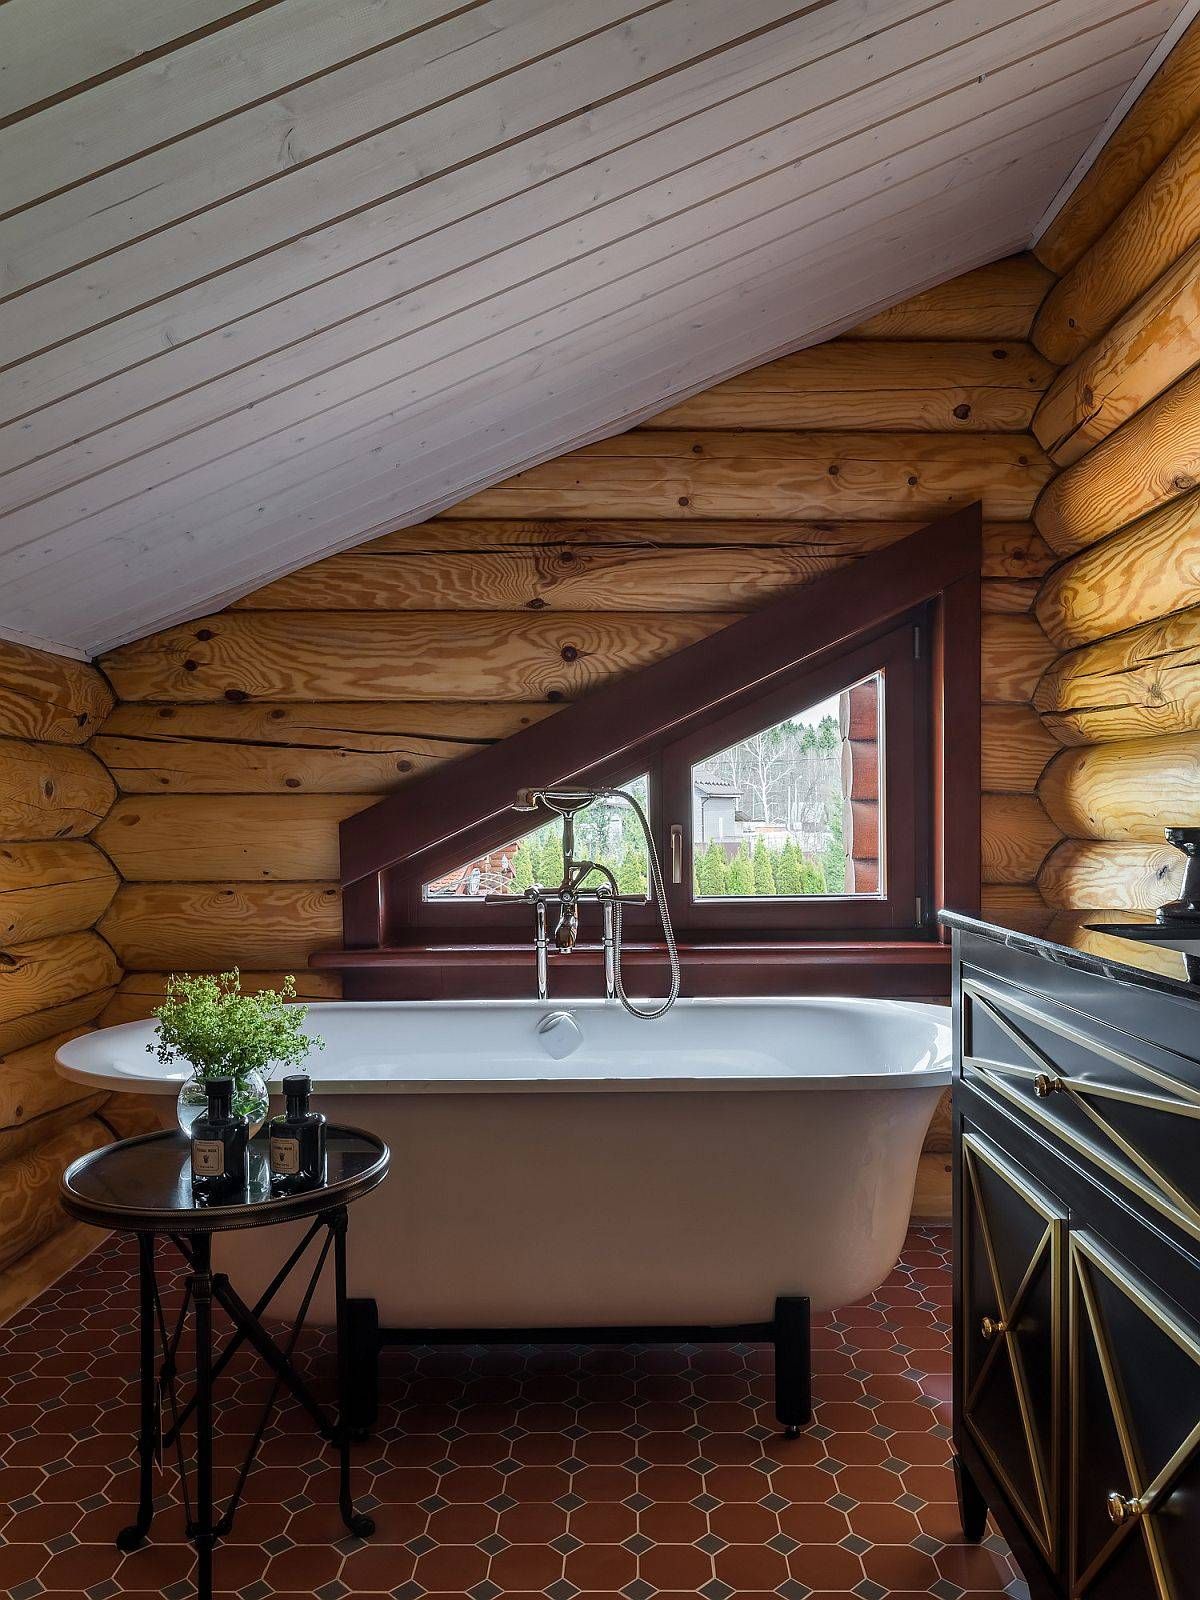 Tiny-attic-bathroom-embraces-the-modern-rustic-style-gleefully-44147